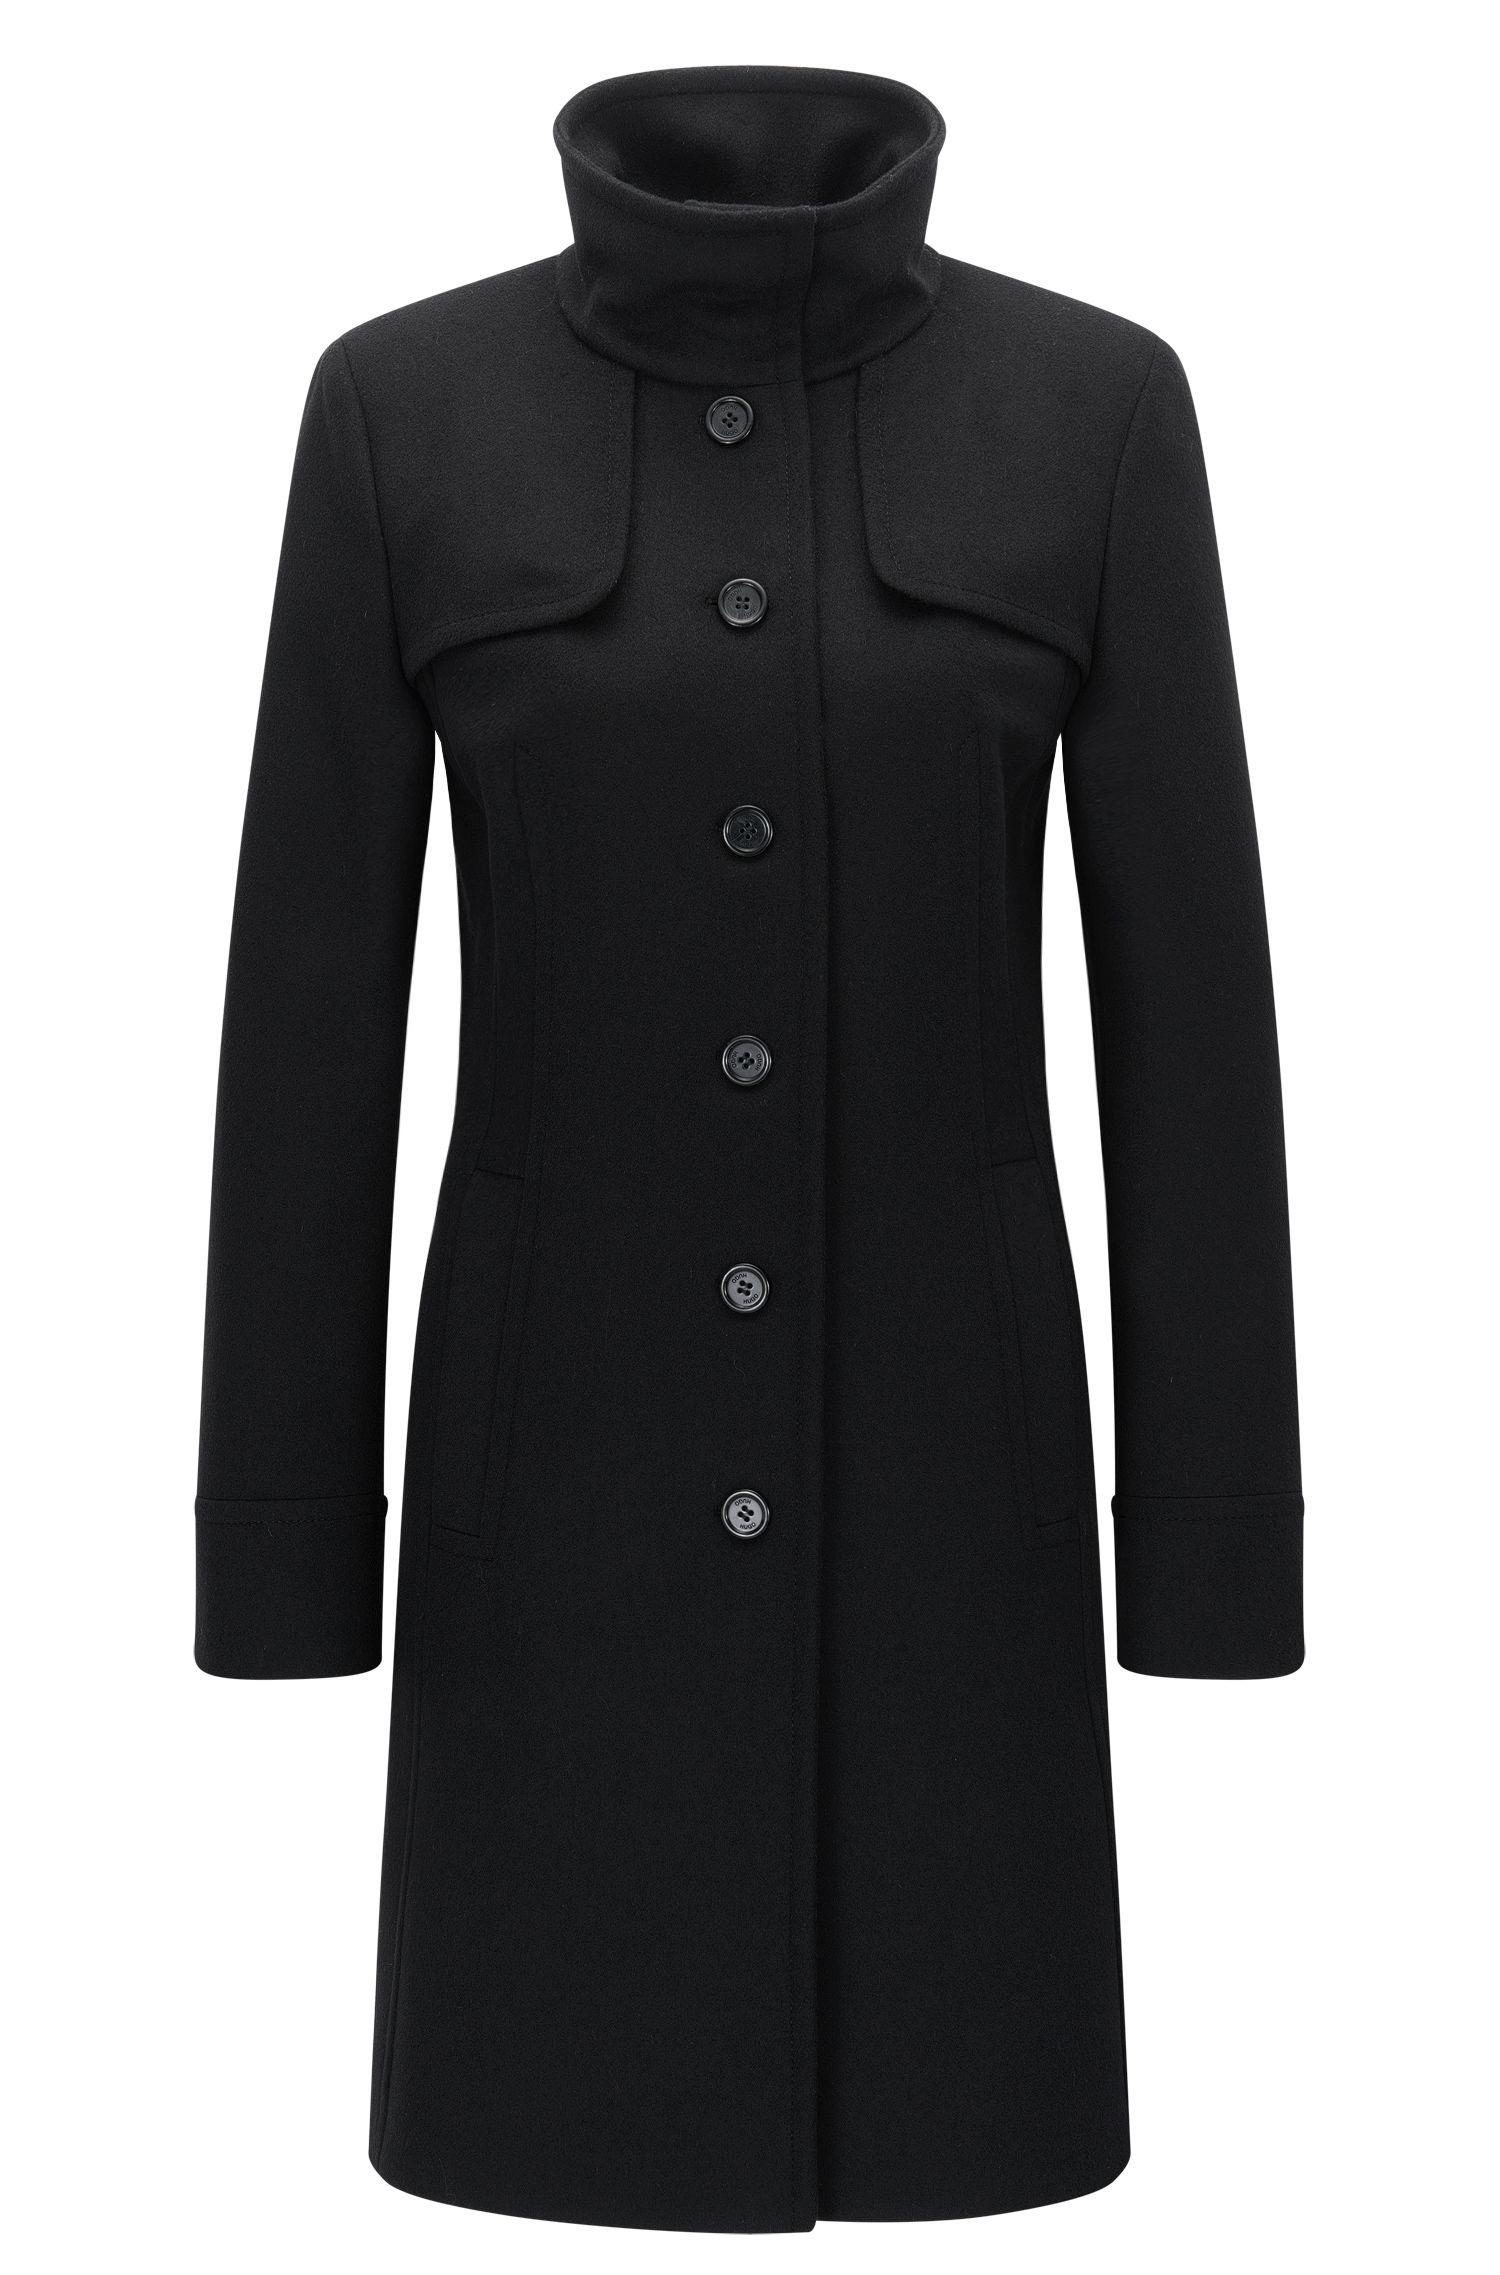 High Collar Virgin Wool Cashmere Coat | Mibelli